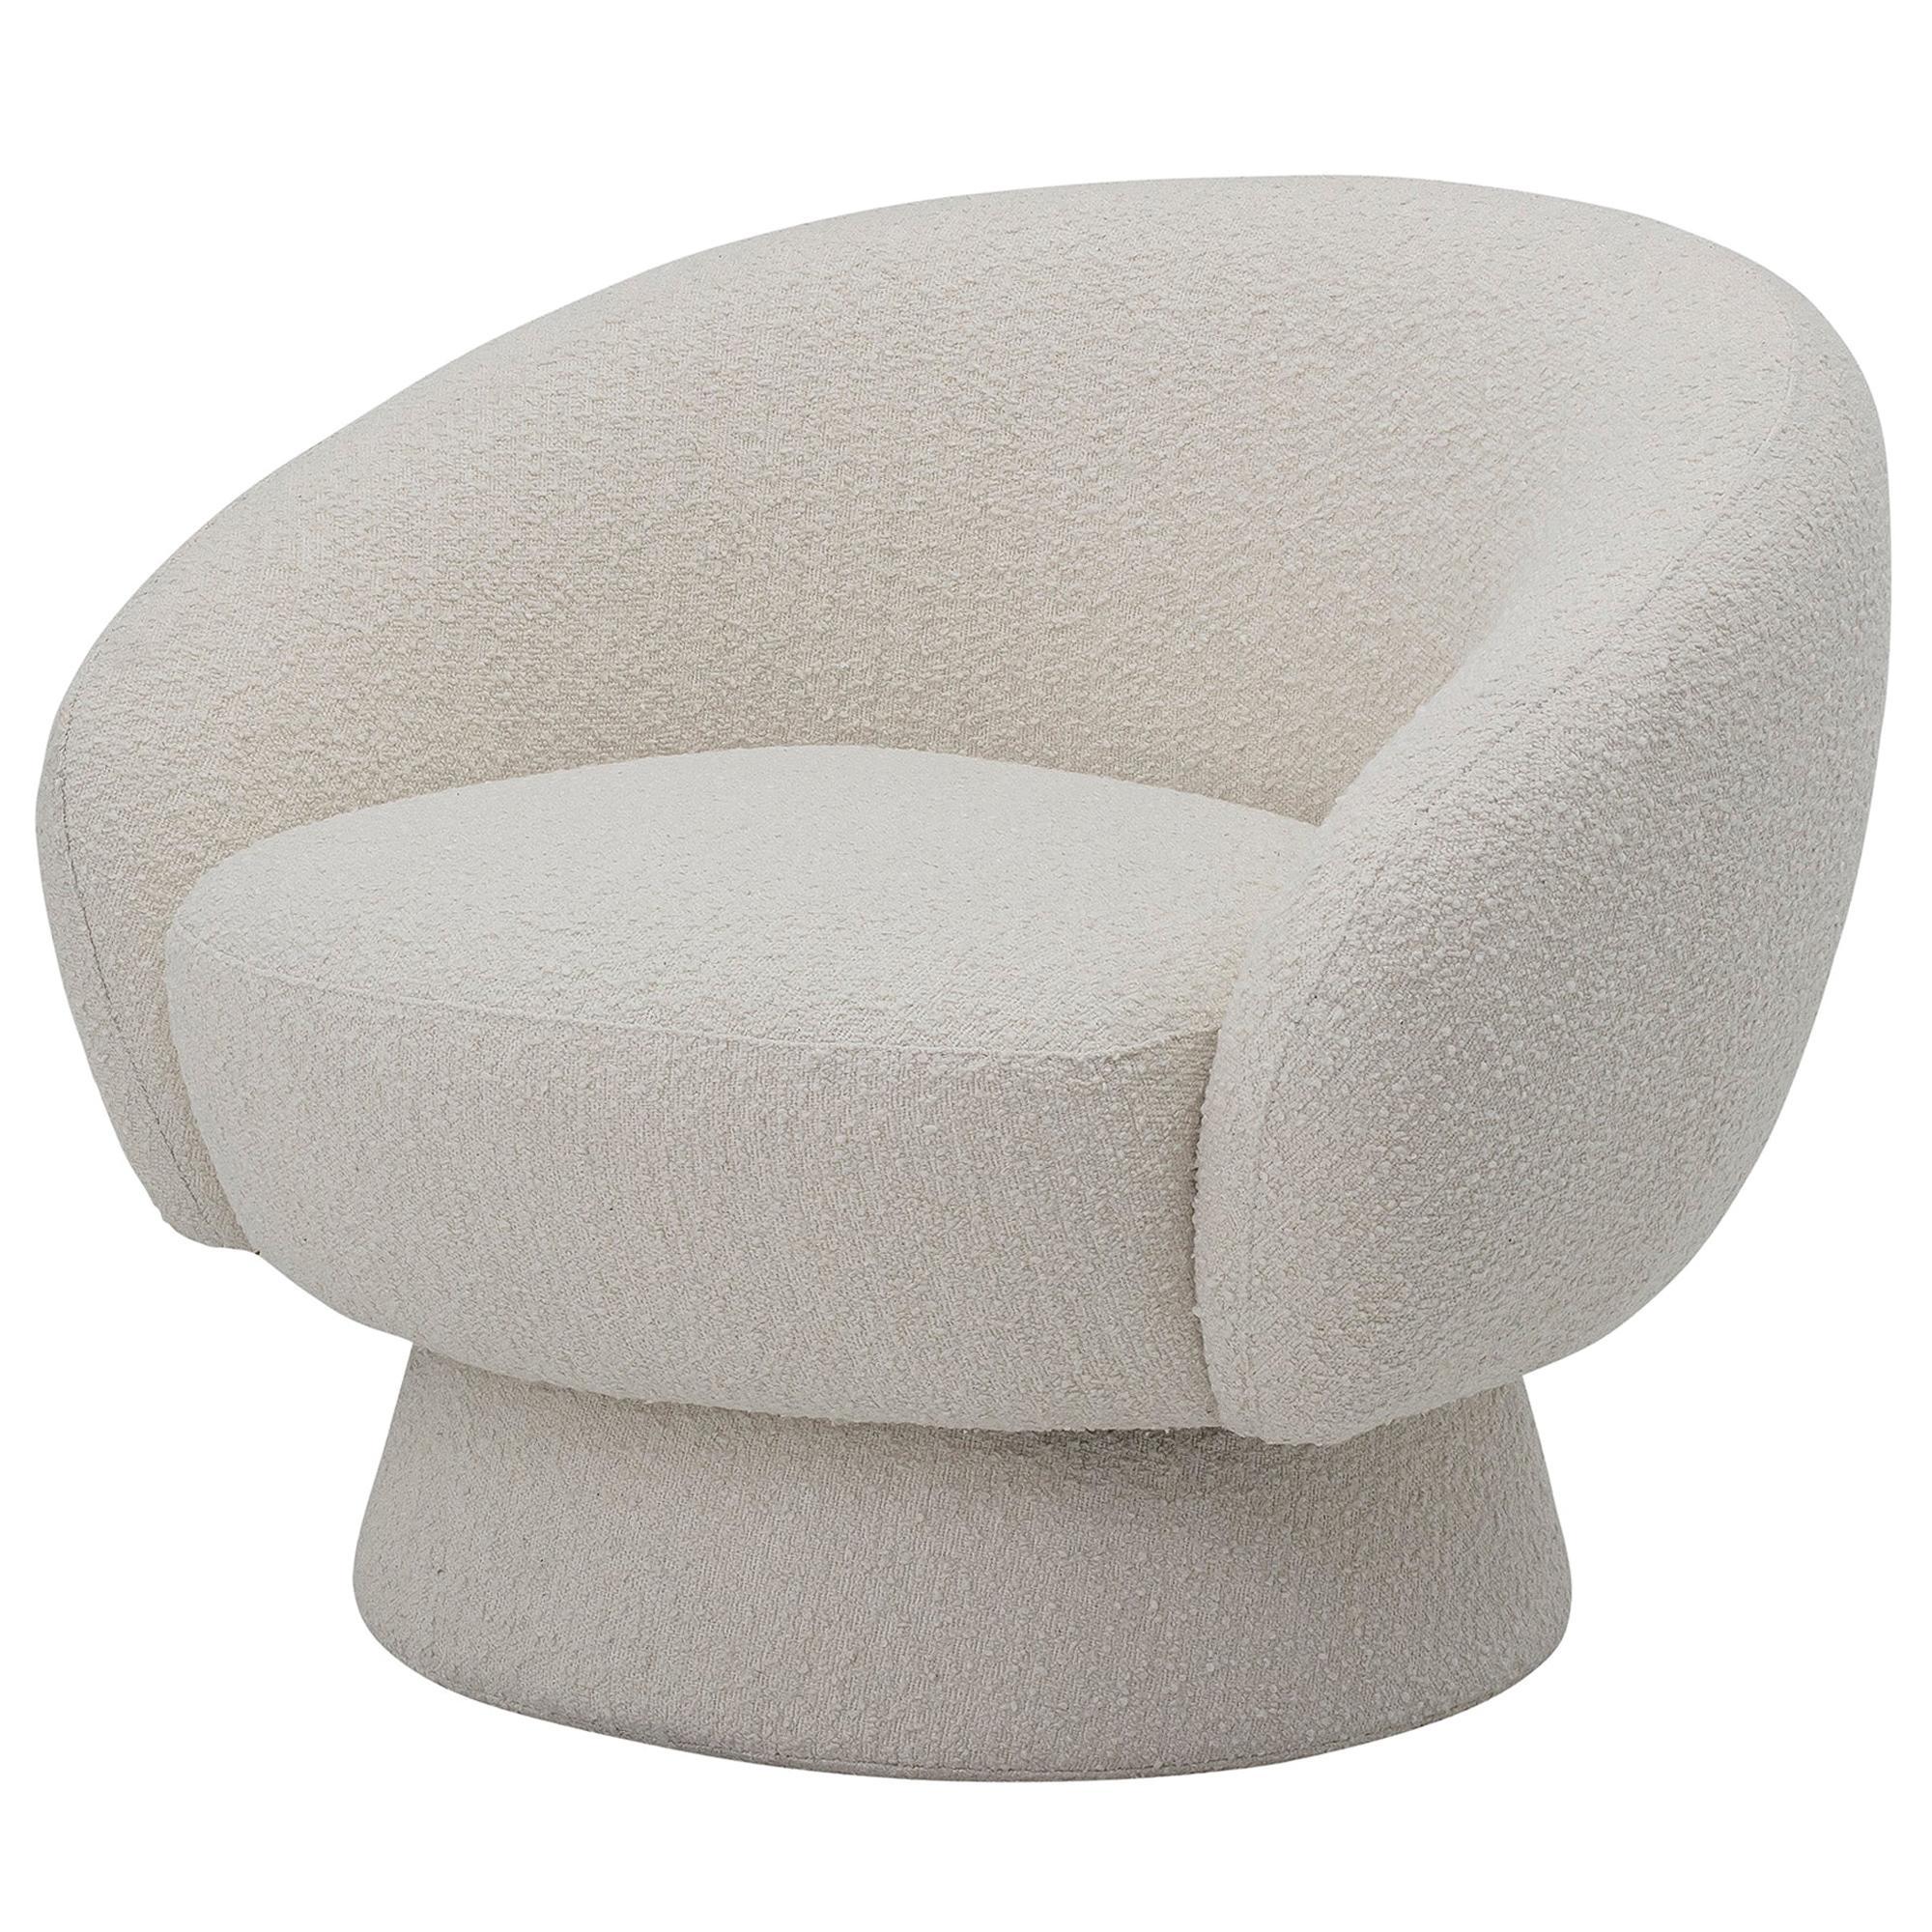 Elephant Club Circular Base Curved Lounge Chair